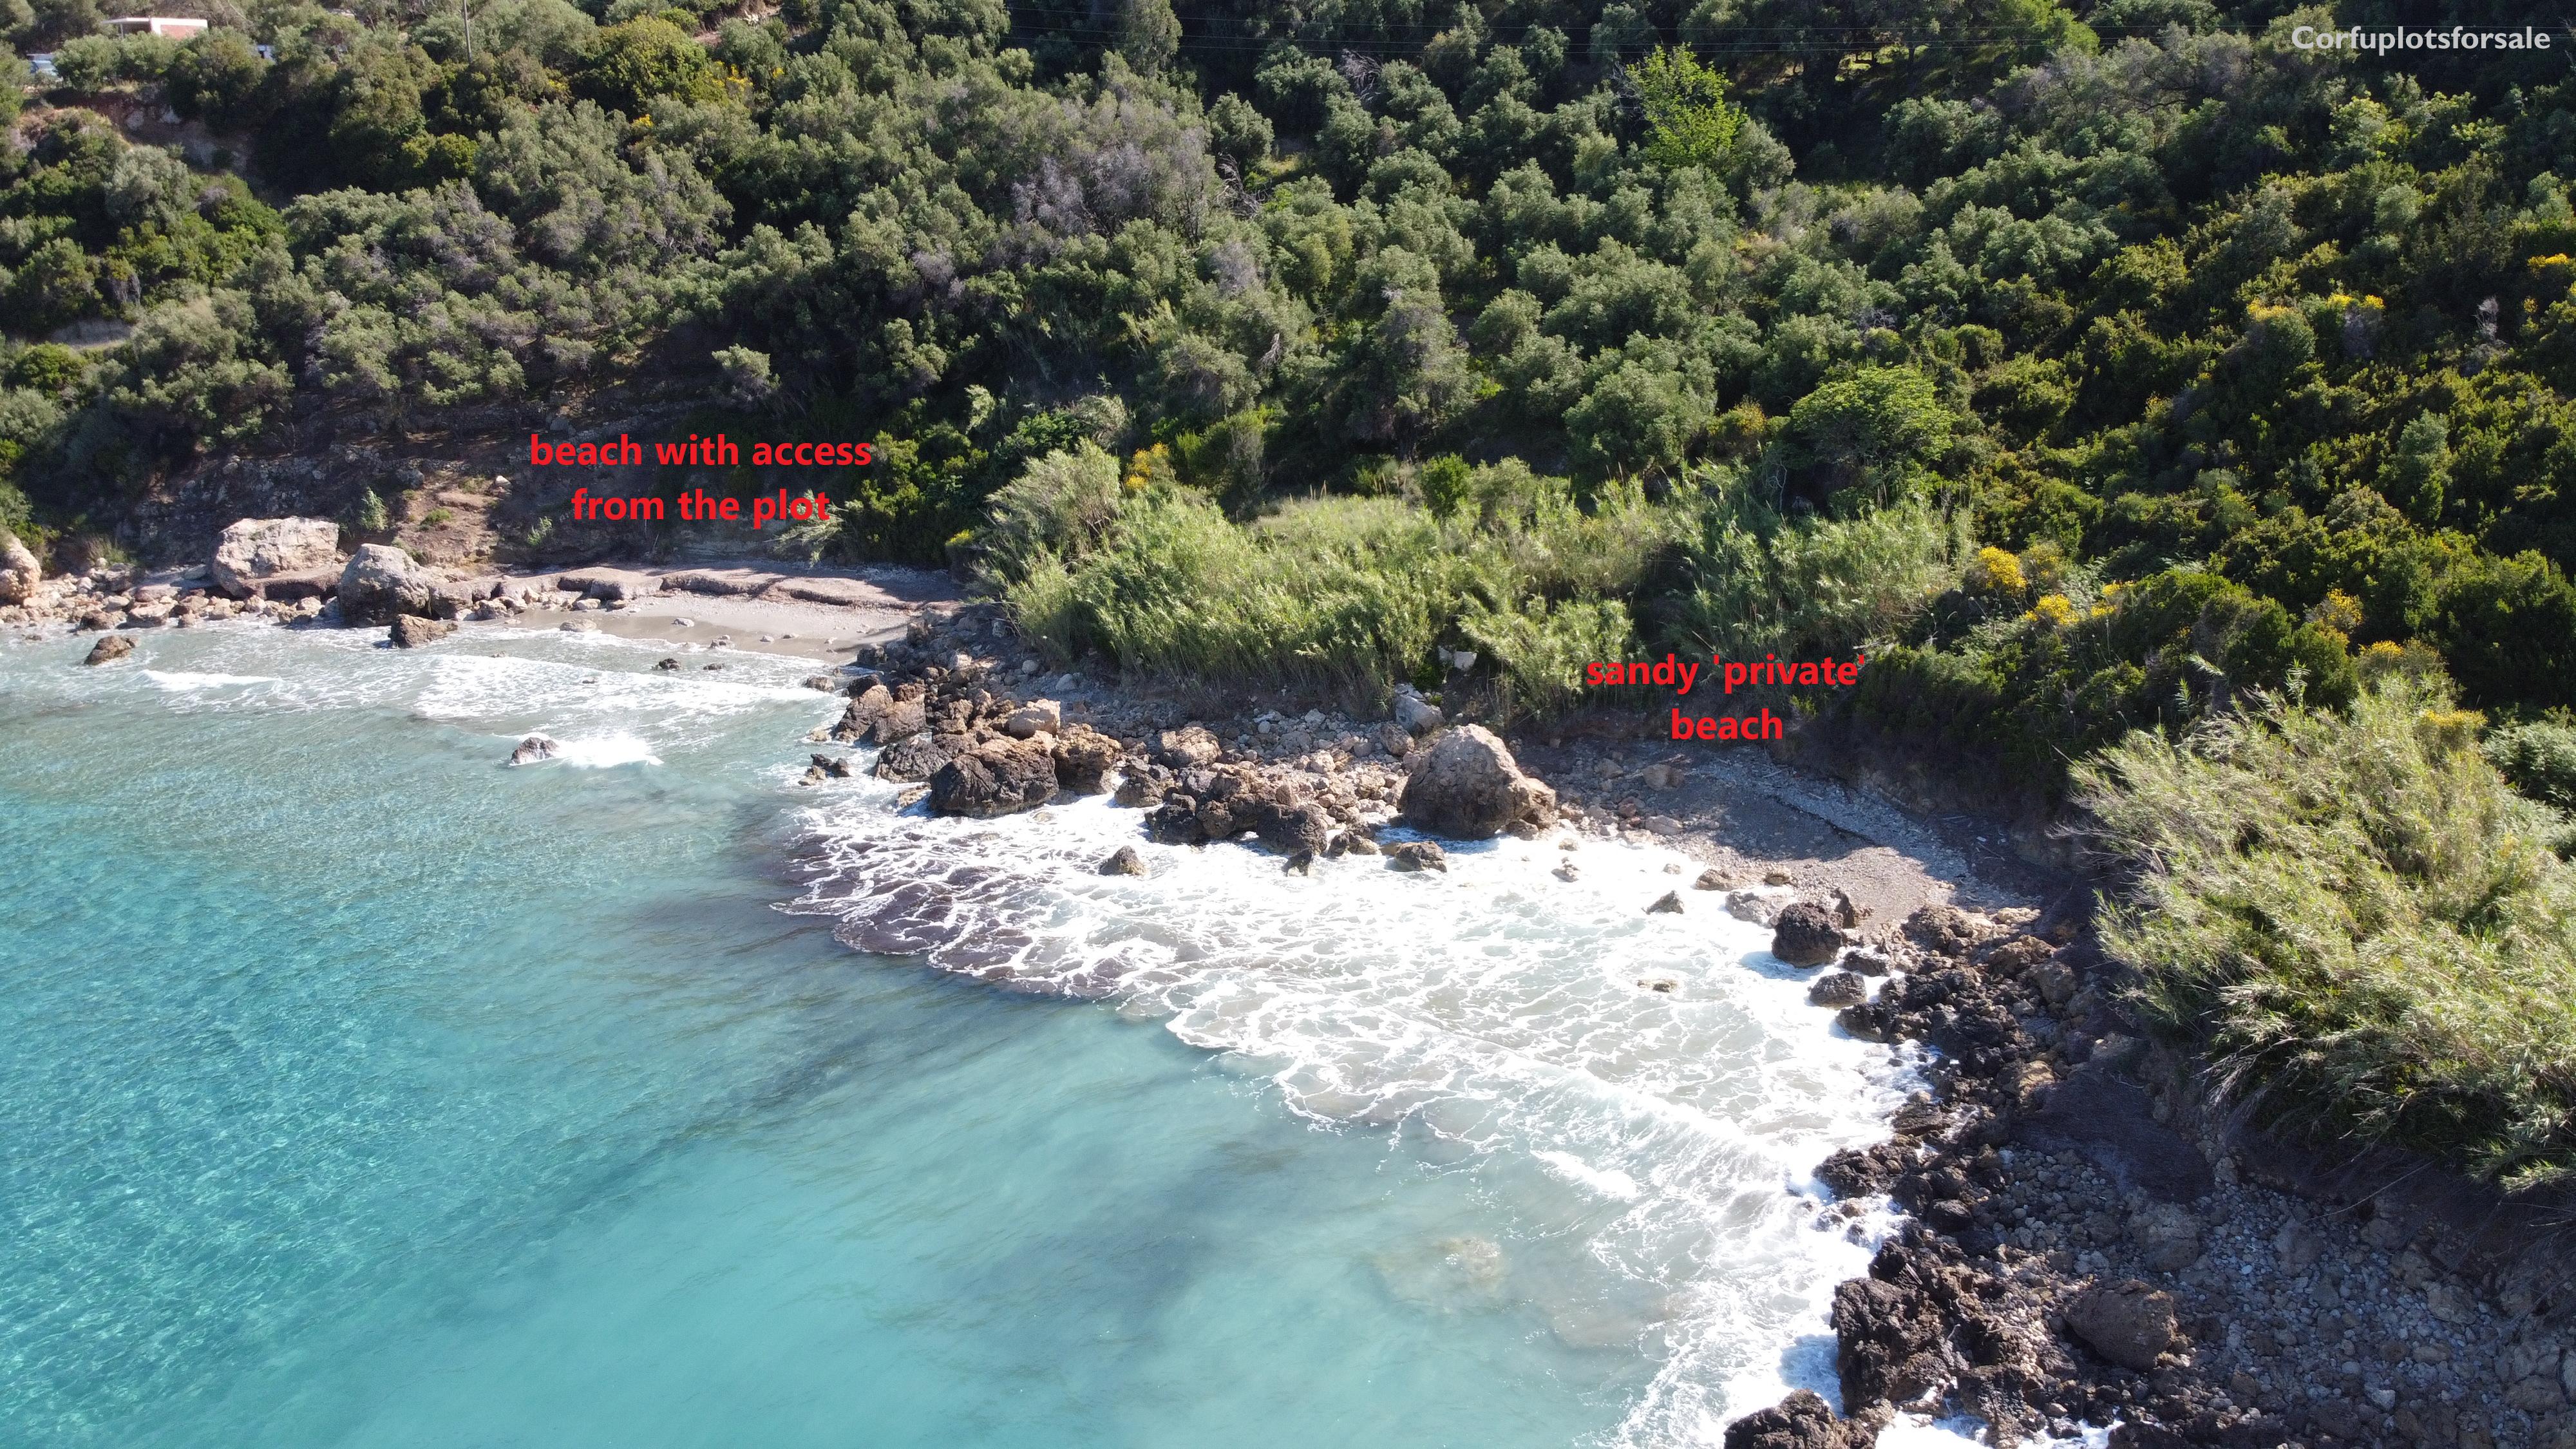 A rare plot with 'private' beach